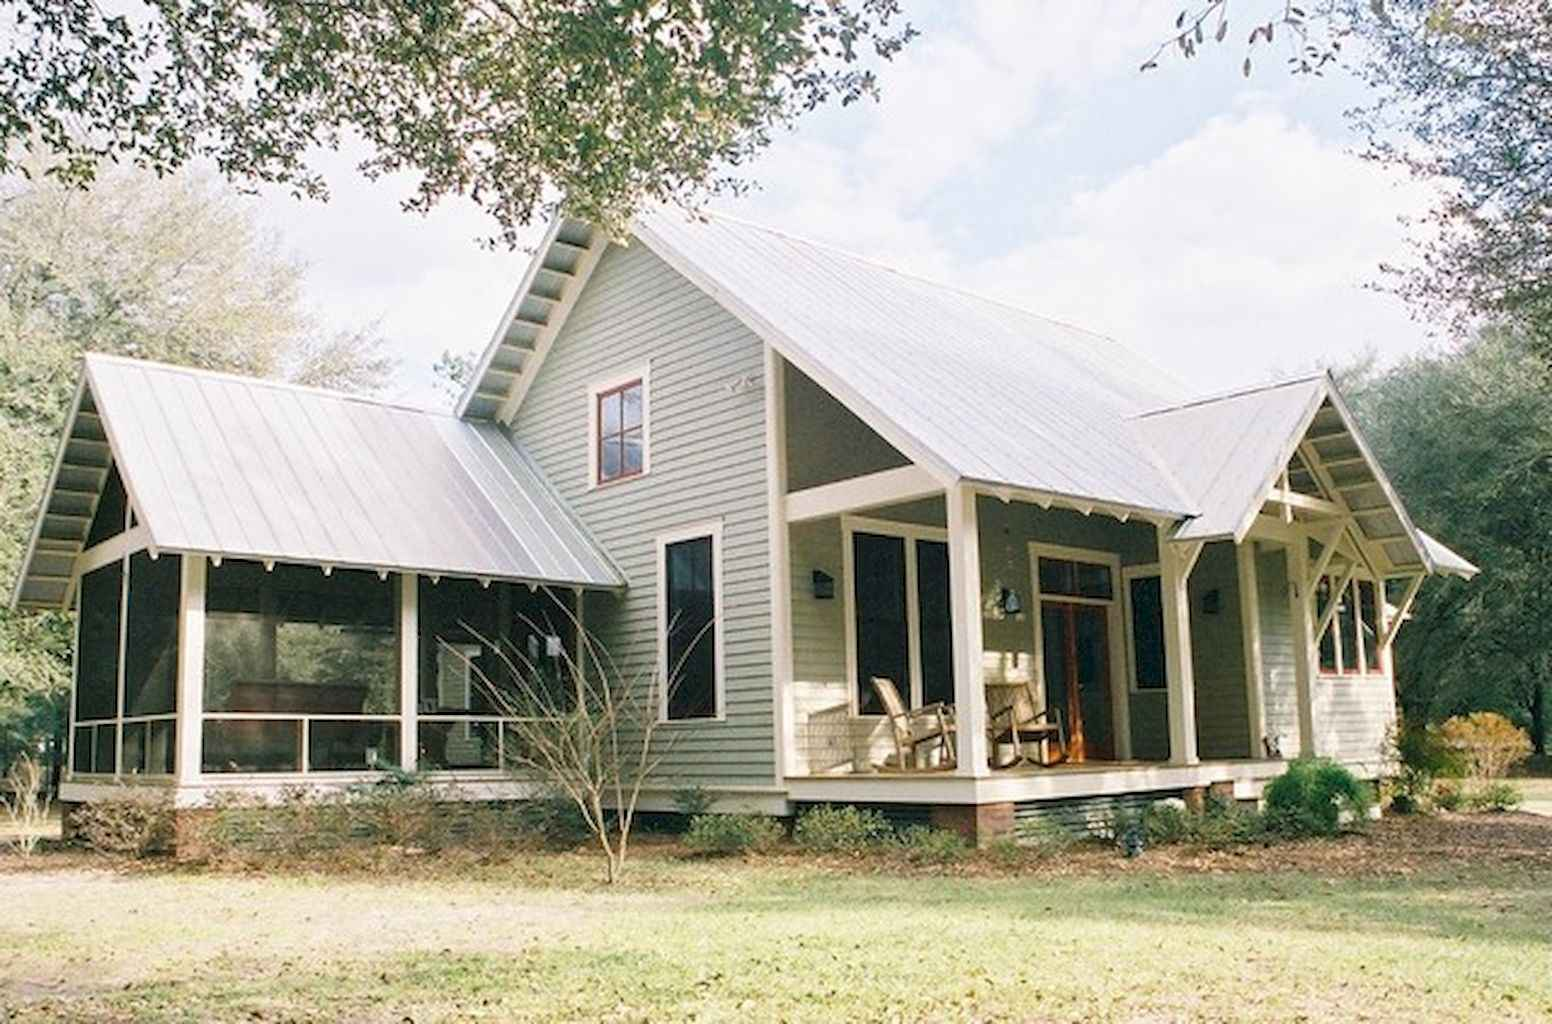 60 amazing farmhouse plans cracker style design ideas (41)